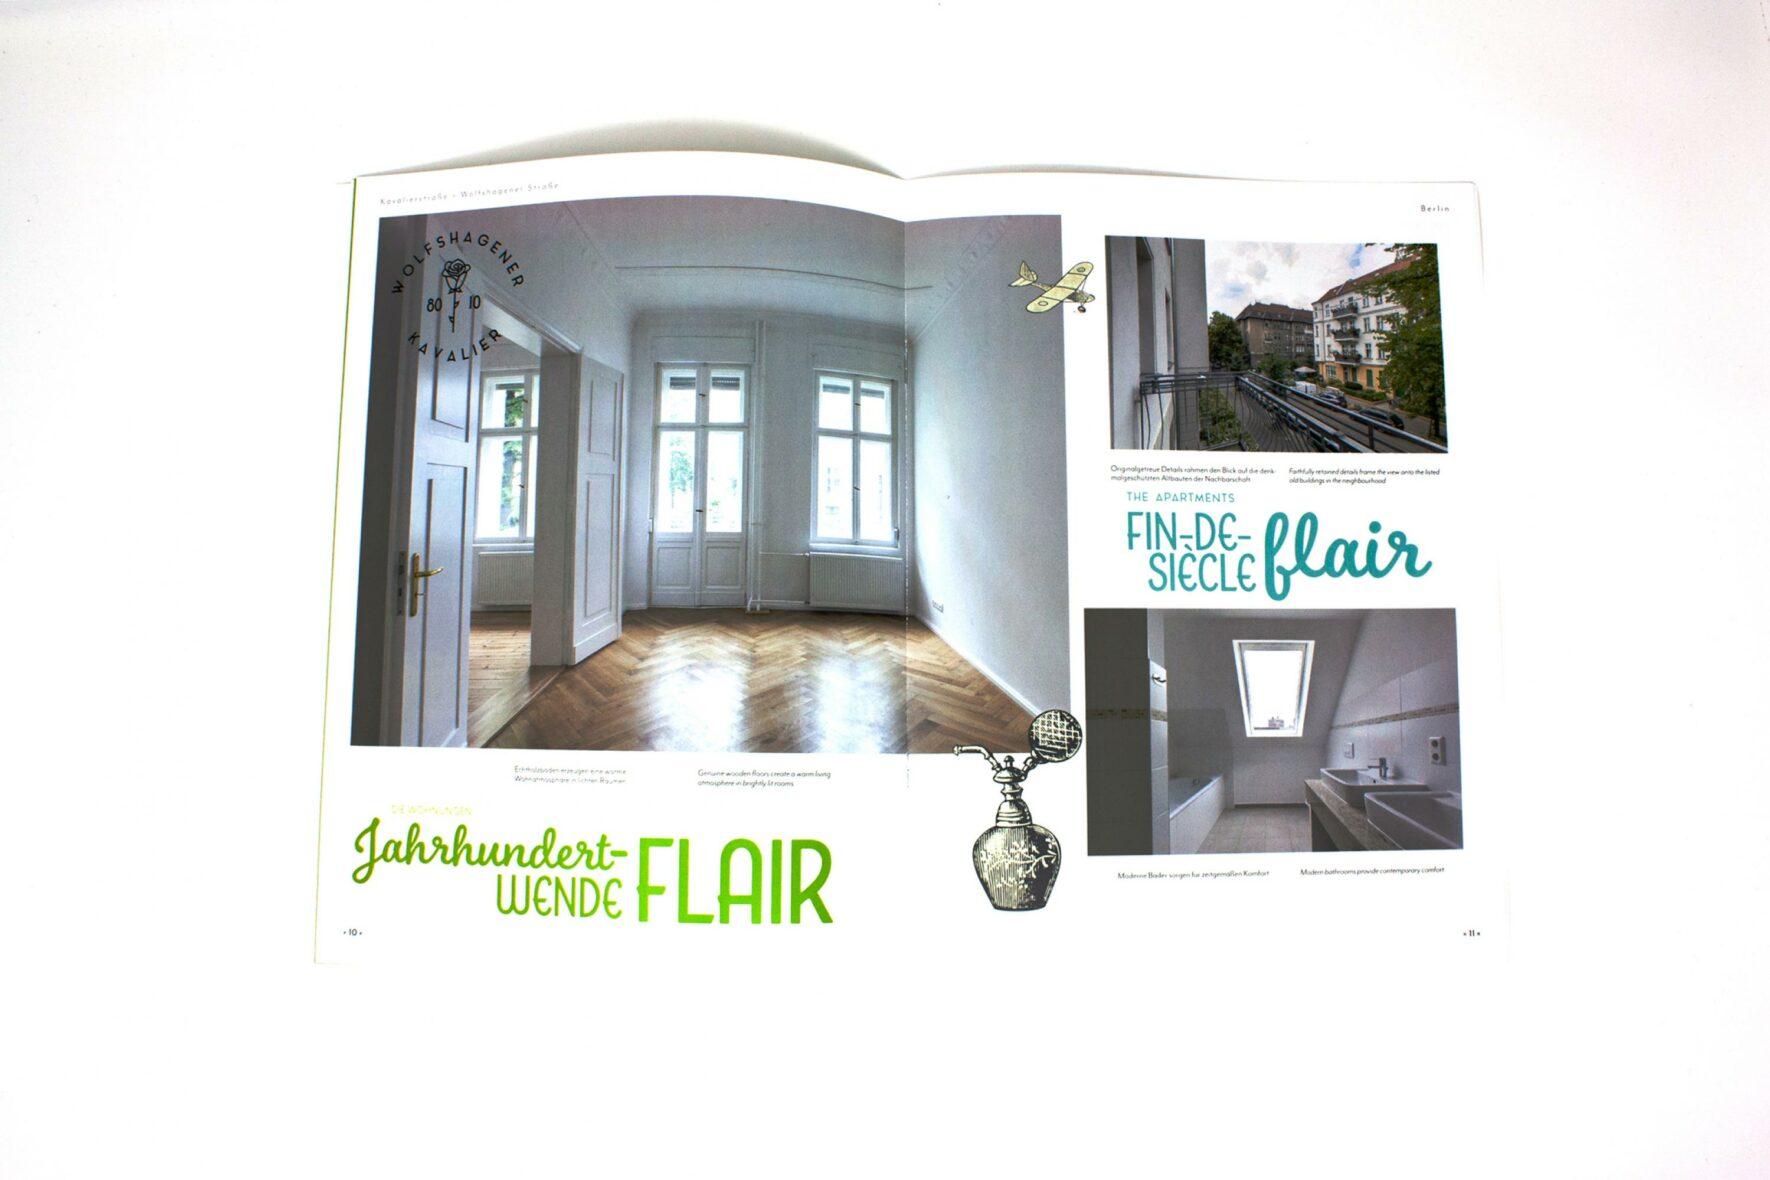 FORMLOS-Trendcity-Immobilien-Corporate-Design-Layout-Broschüre-11